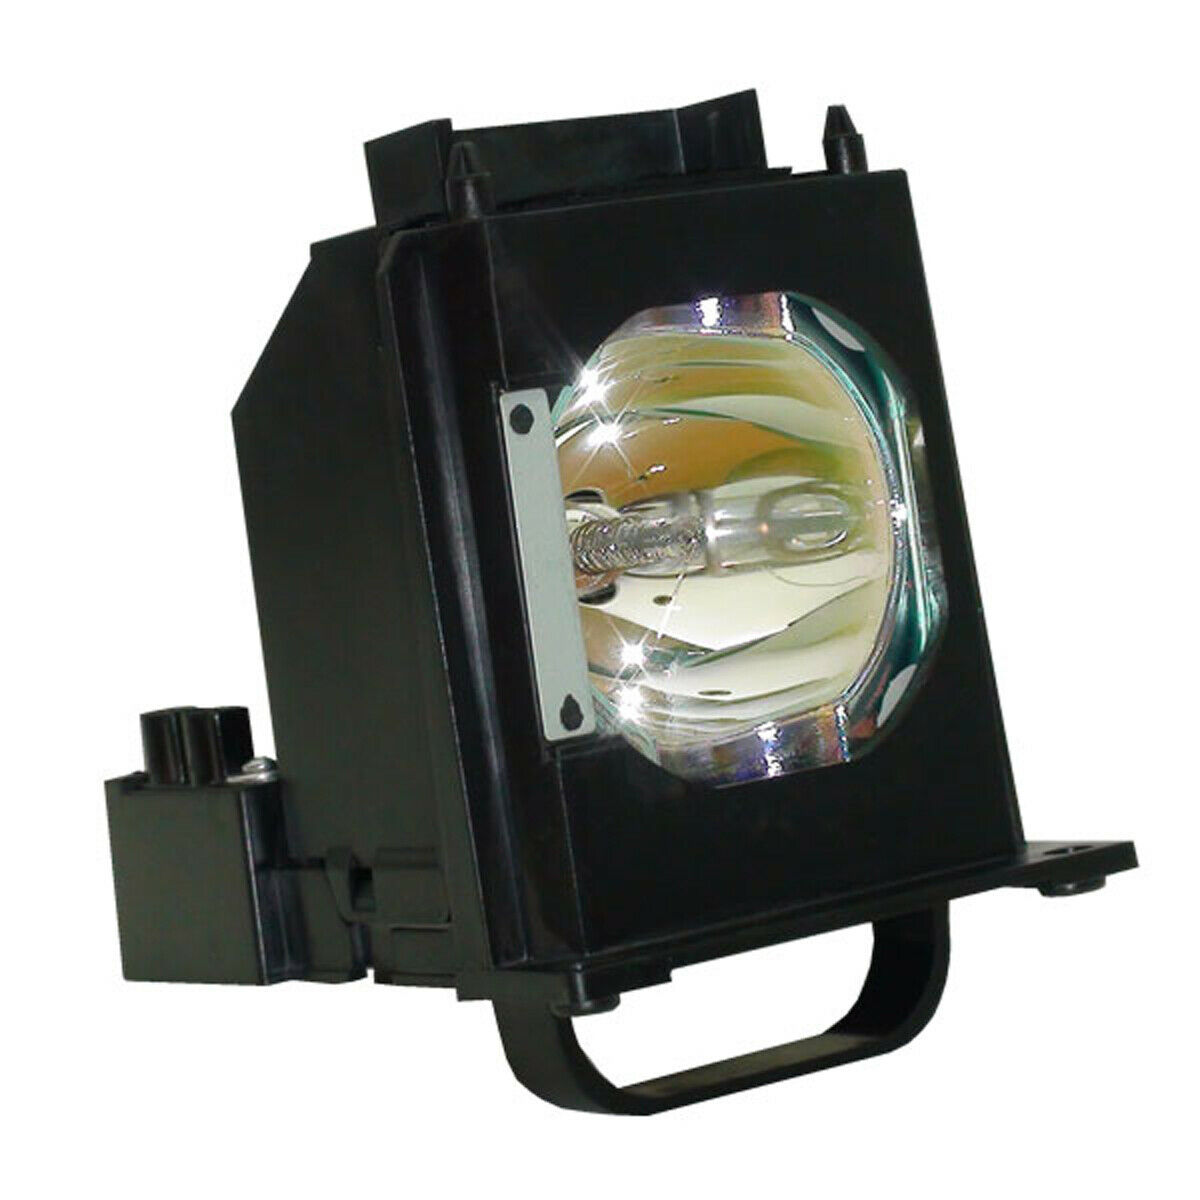 WD-60C8 WD60C8 915B403001 Replacement Mitsubishi TV Lamp